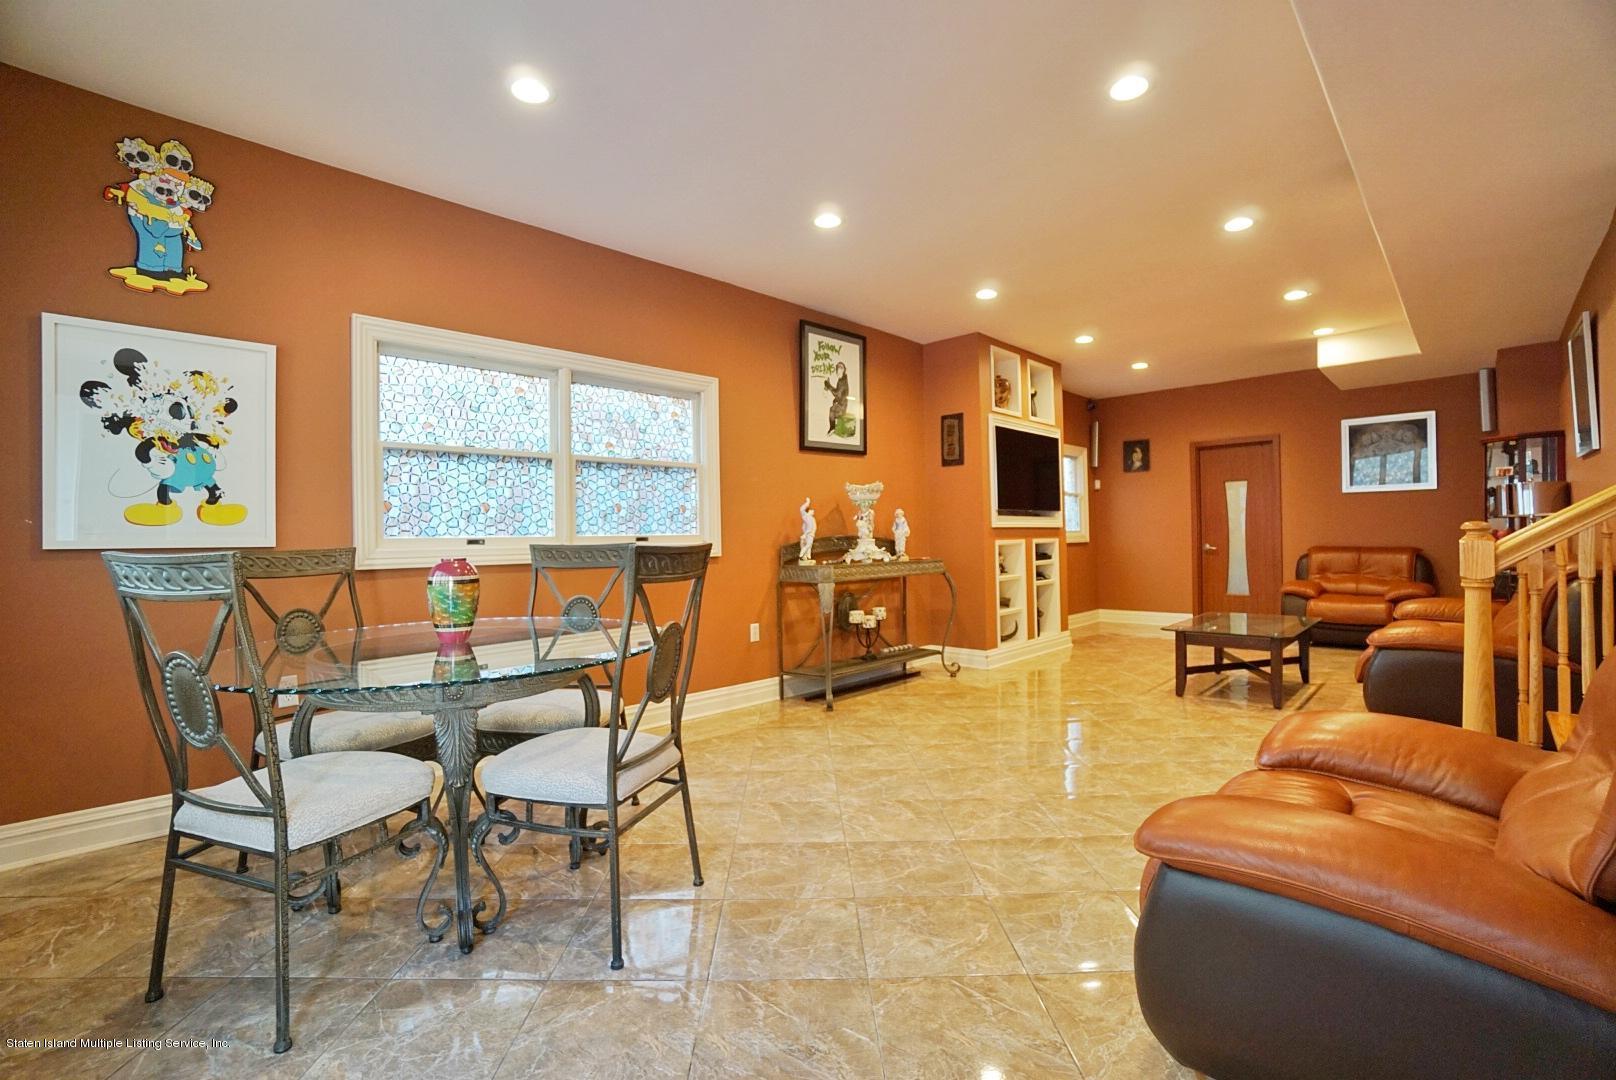 Single Family - Detached 48 Ocean Terrace  Staten Island, NY 10314, MLS-1130826-32